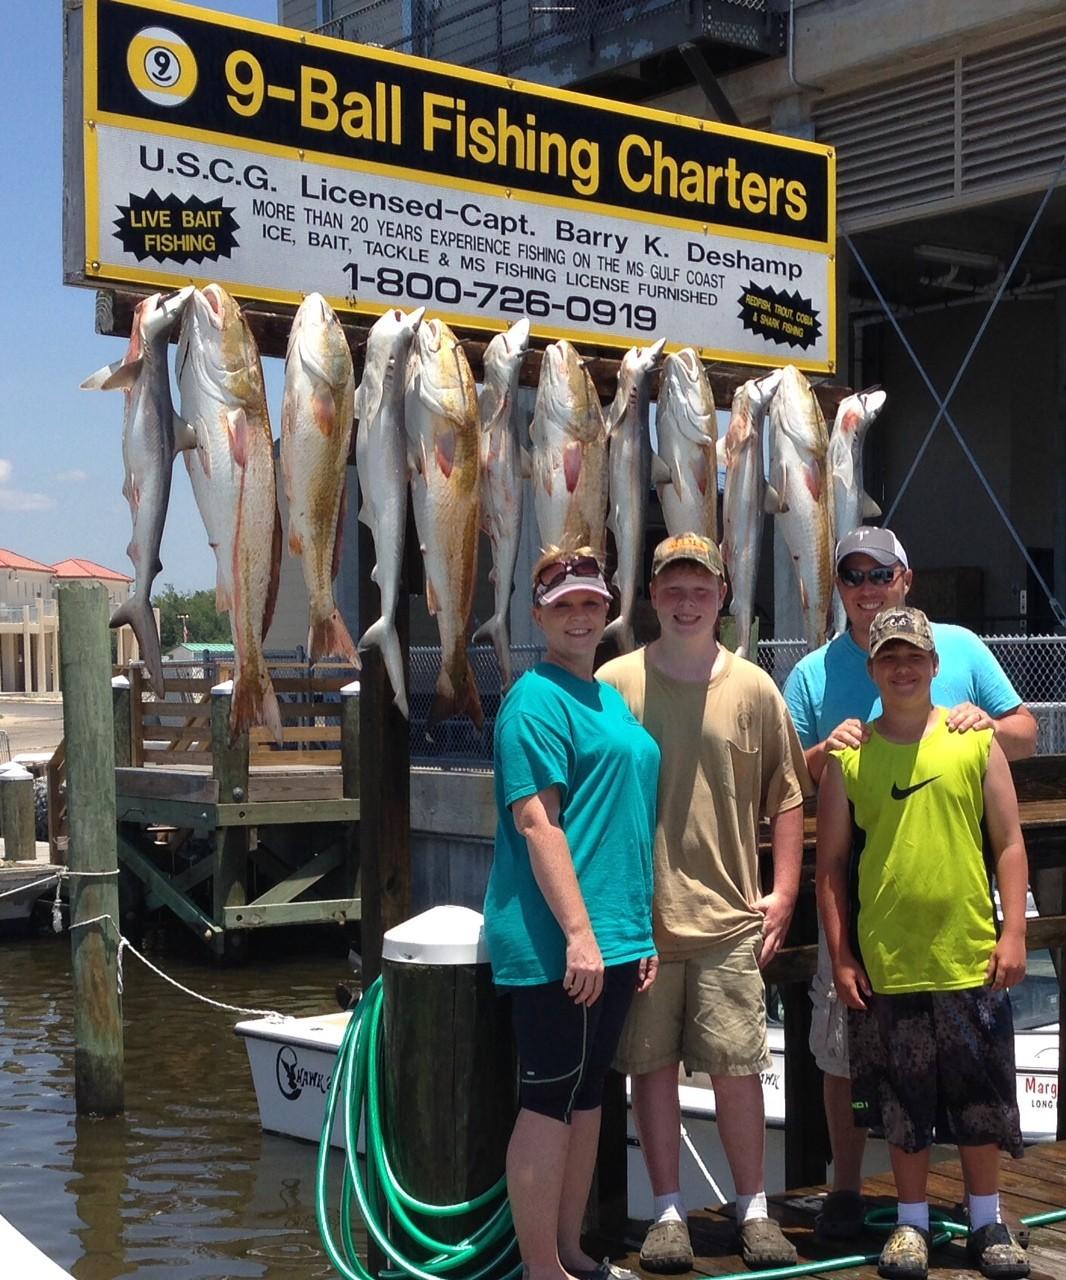 9 Ball Fishing Charters: Mississippi Fishing Charter